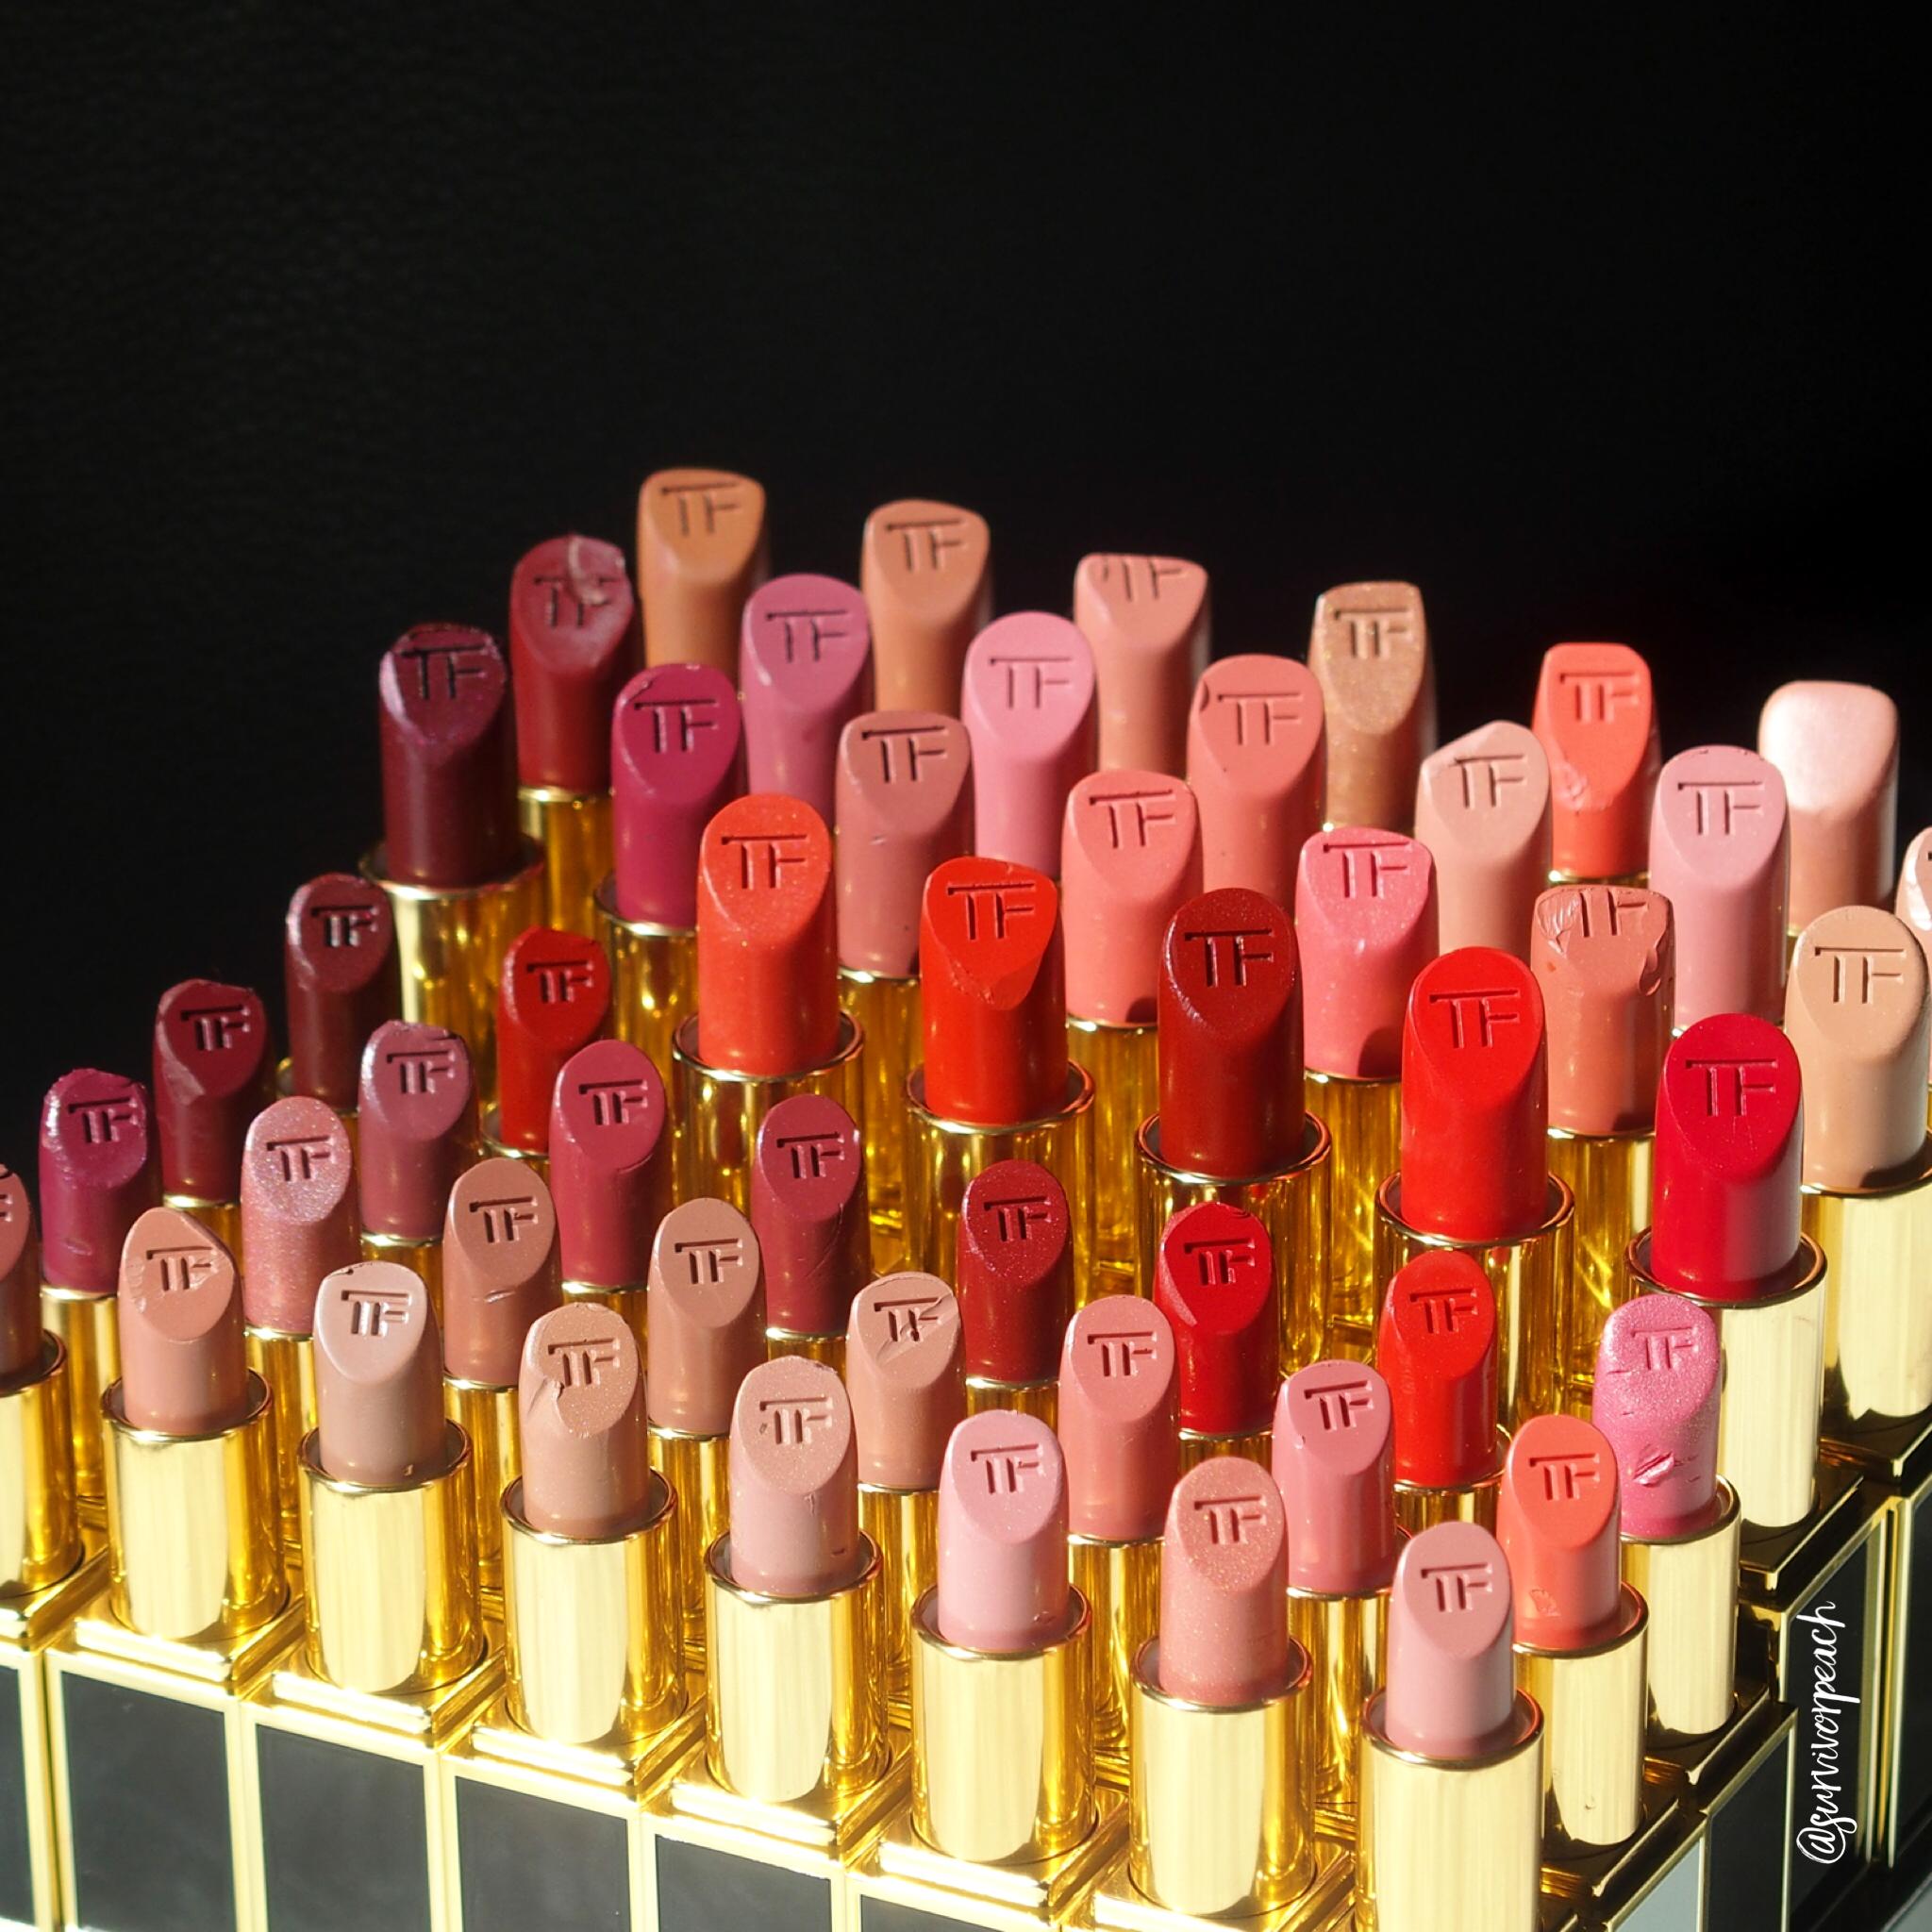 Tom Ford Lipsticks: Creams, Mattes, Girls and Boys